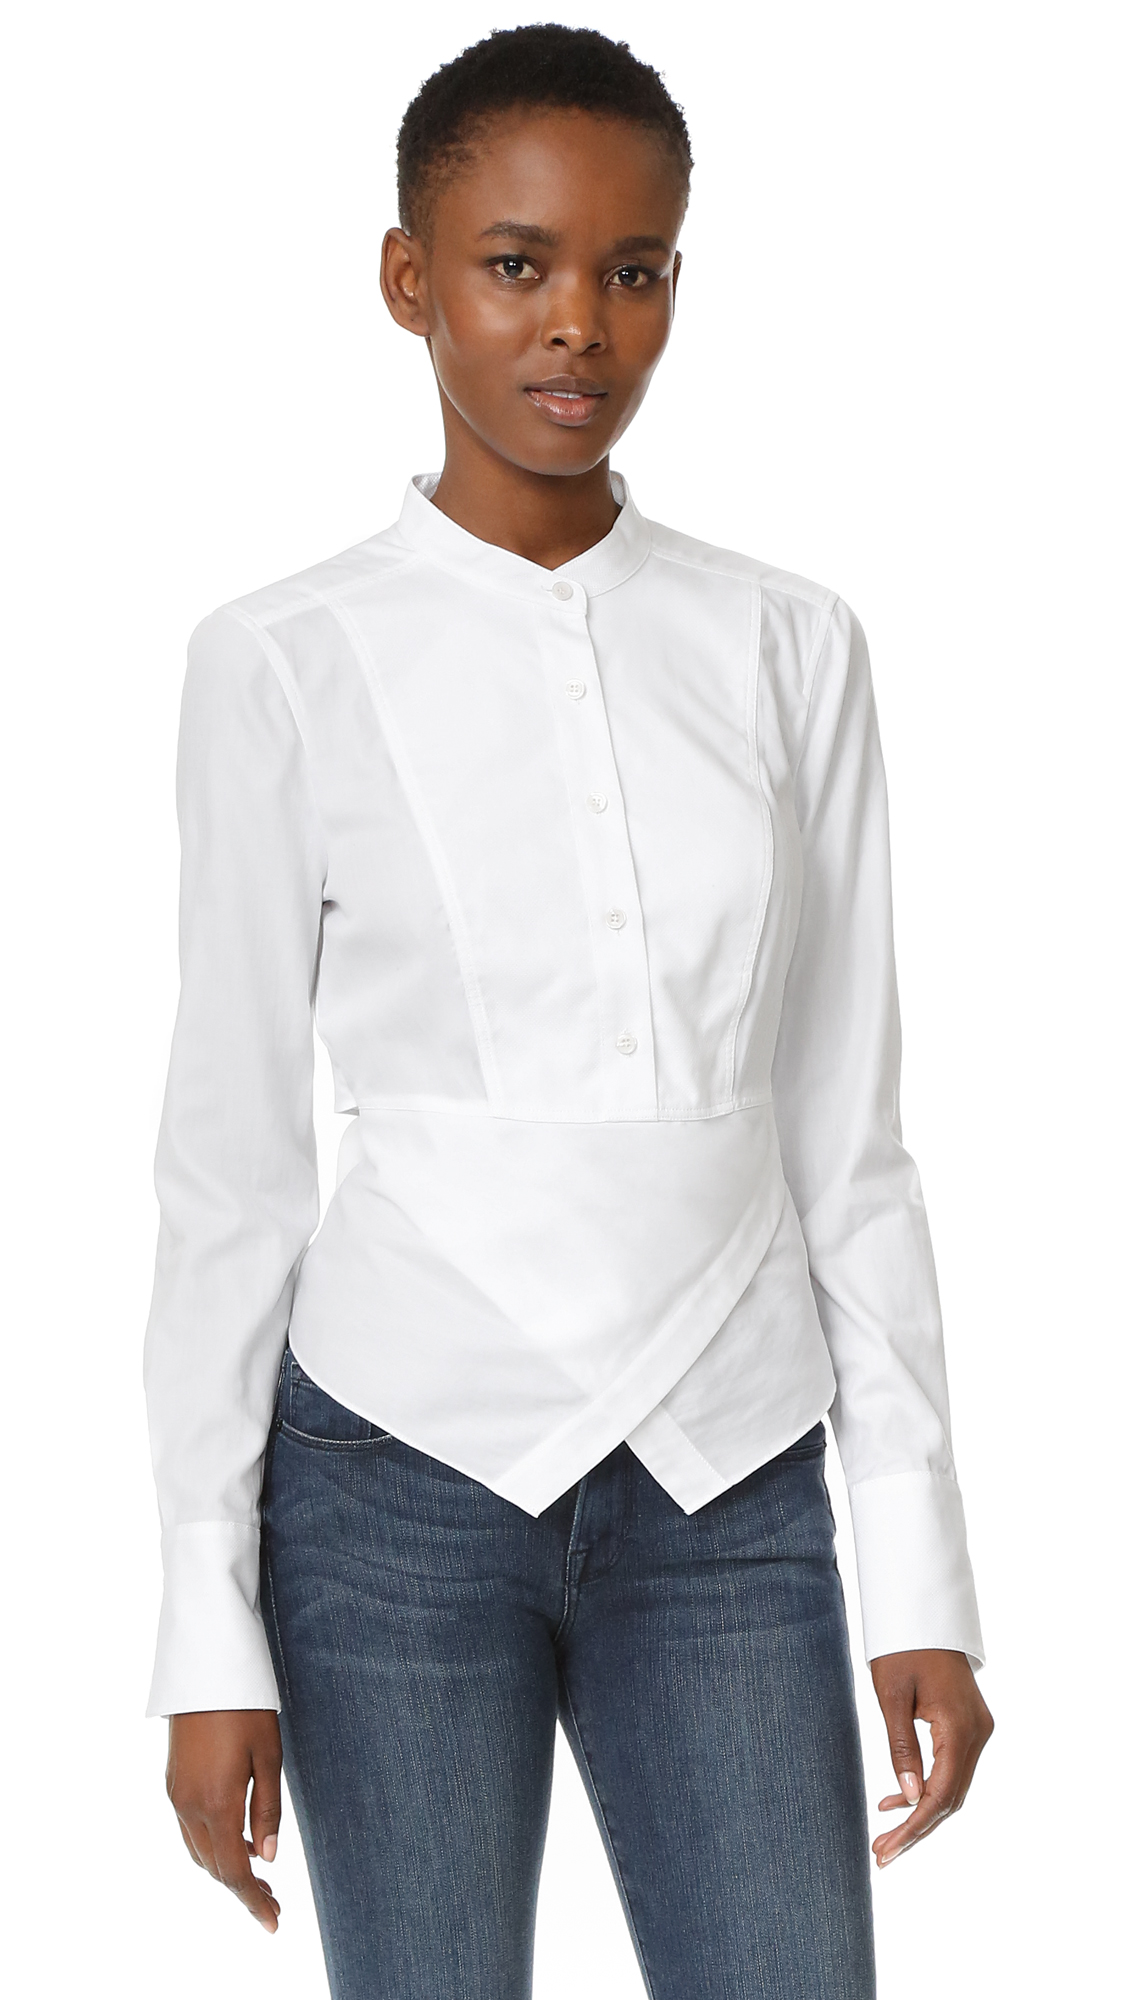 Bcbgmaxazria Kathryn Wrap Blouse - White at Shopbop